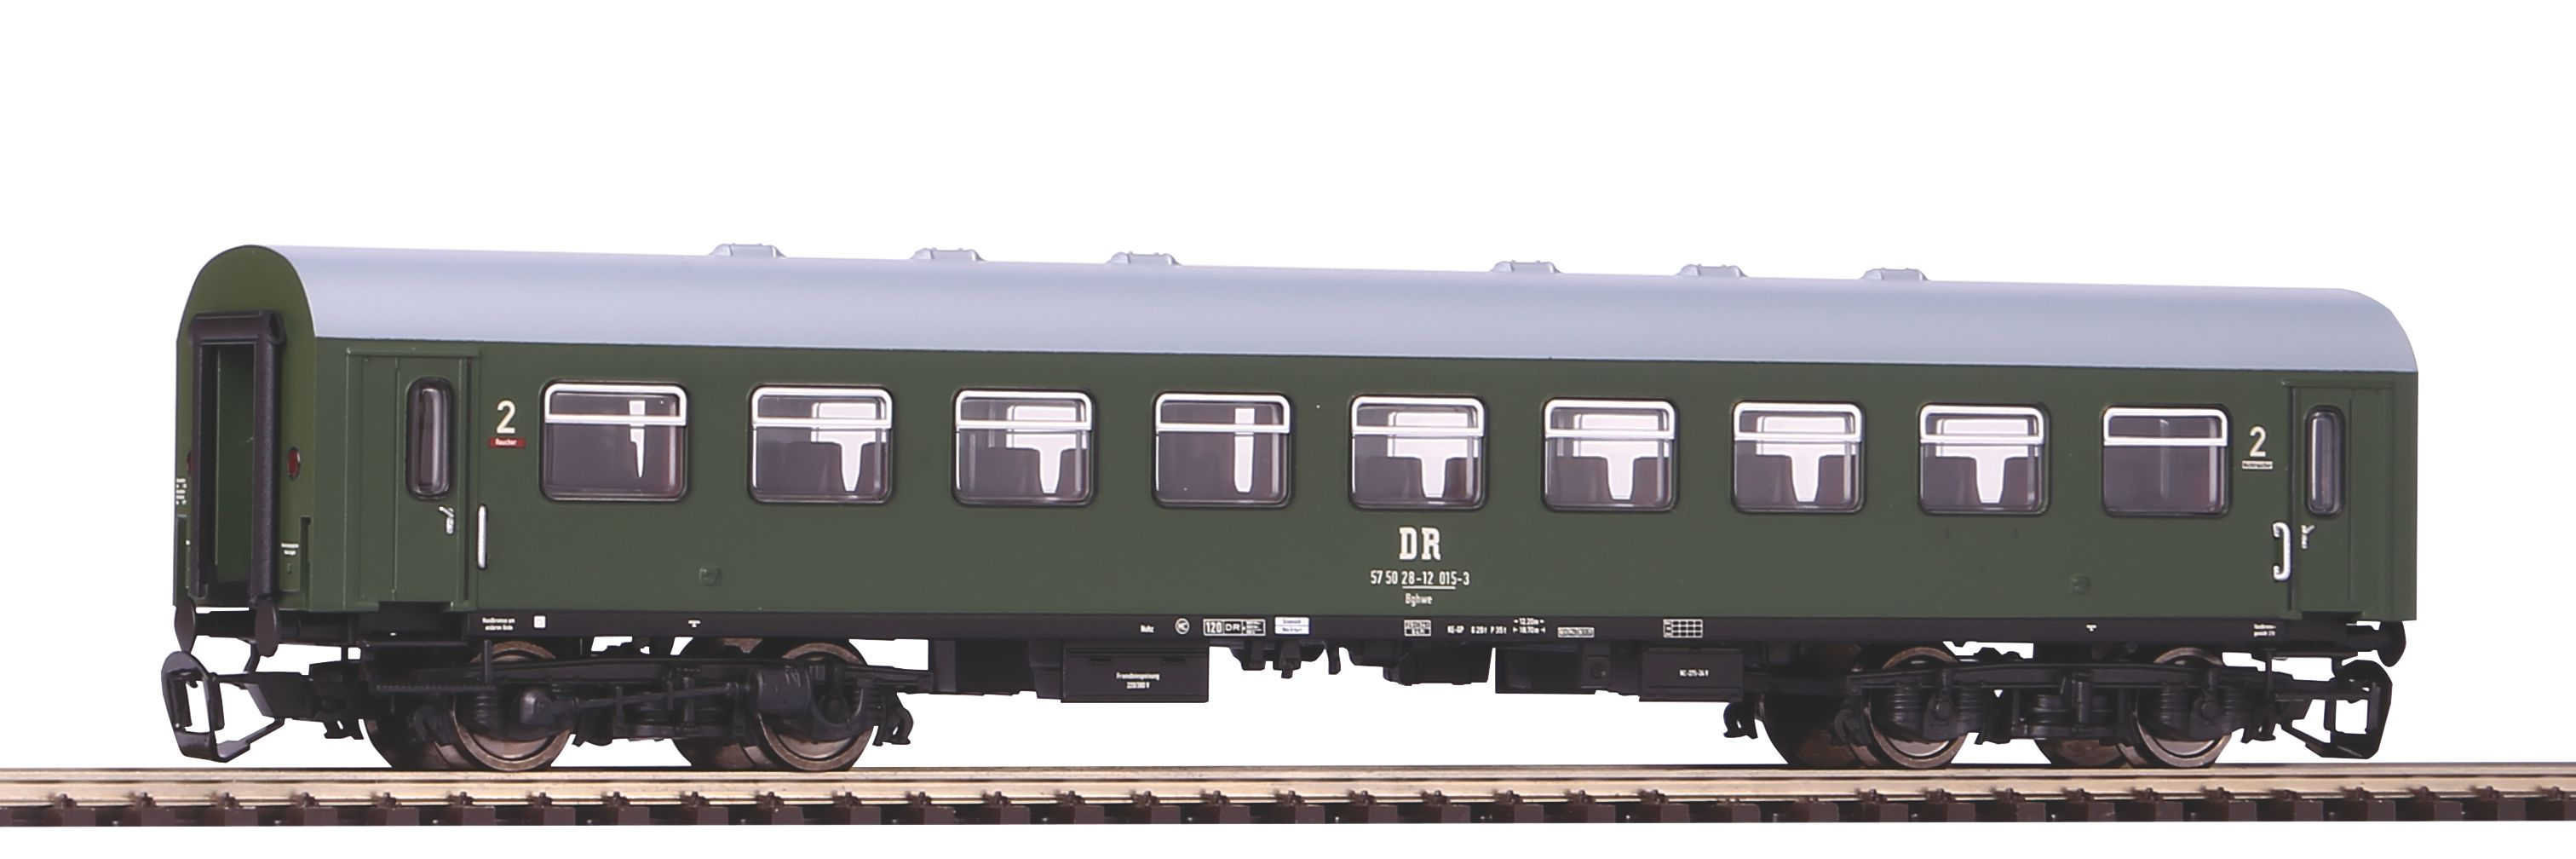 Piko Osobní vagón Reko 2. Tř. DR IV - 47601